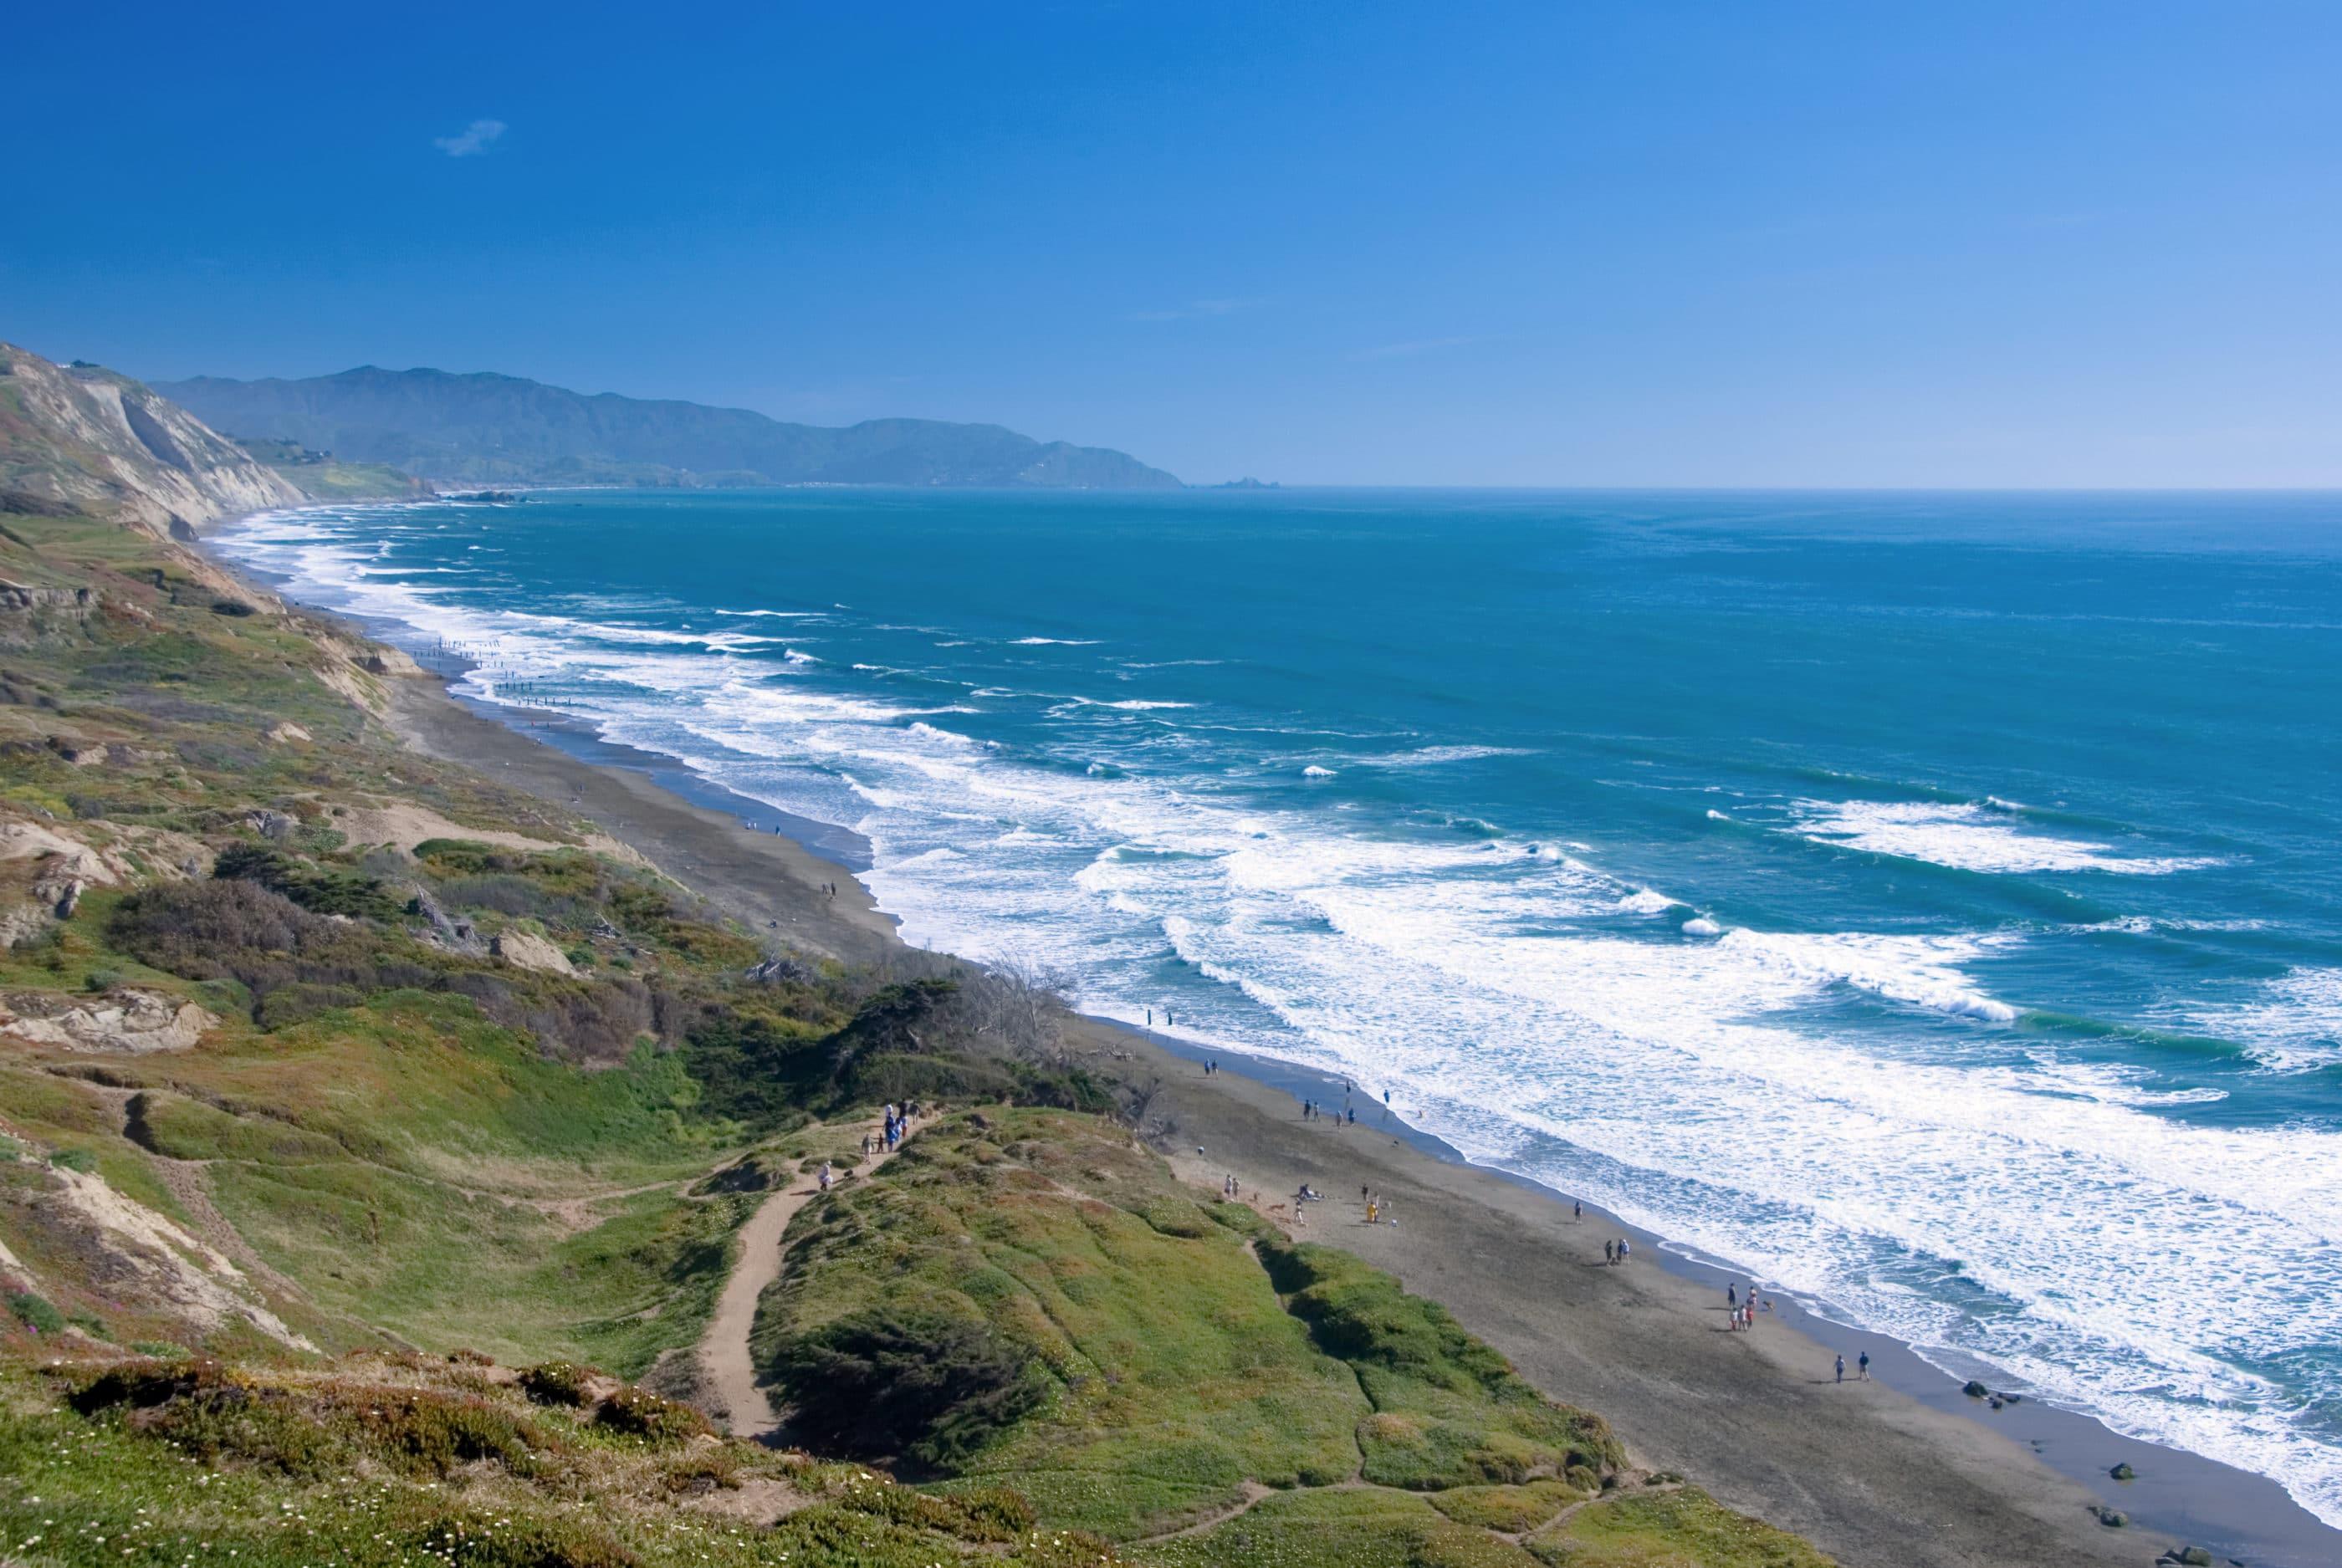 San Francisco beaches: Fort Funston